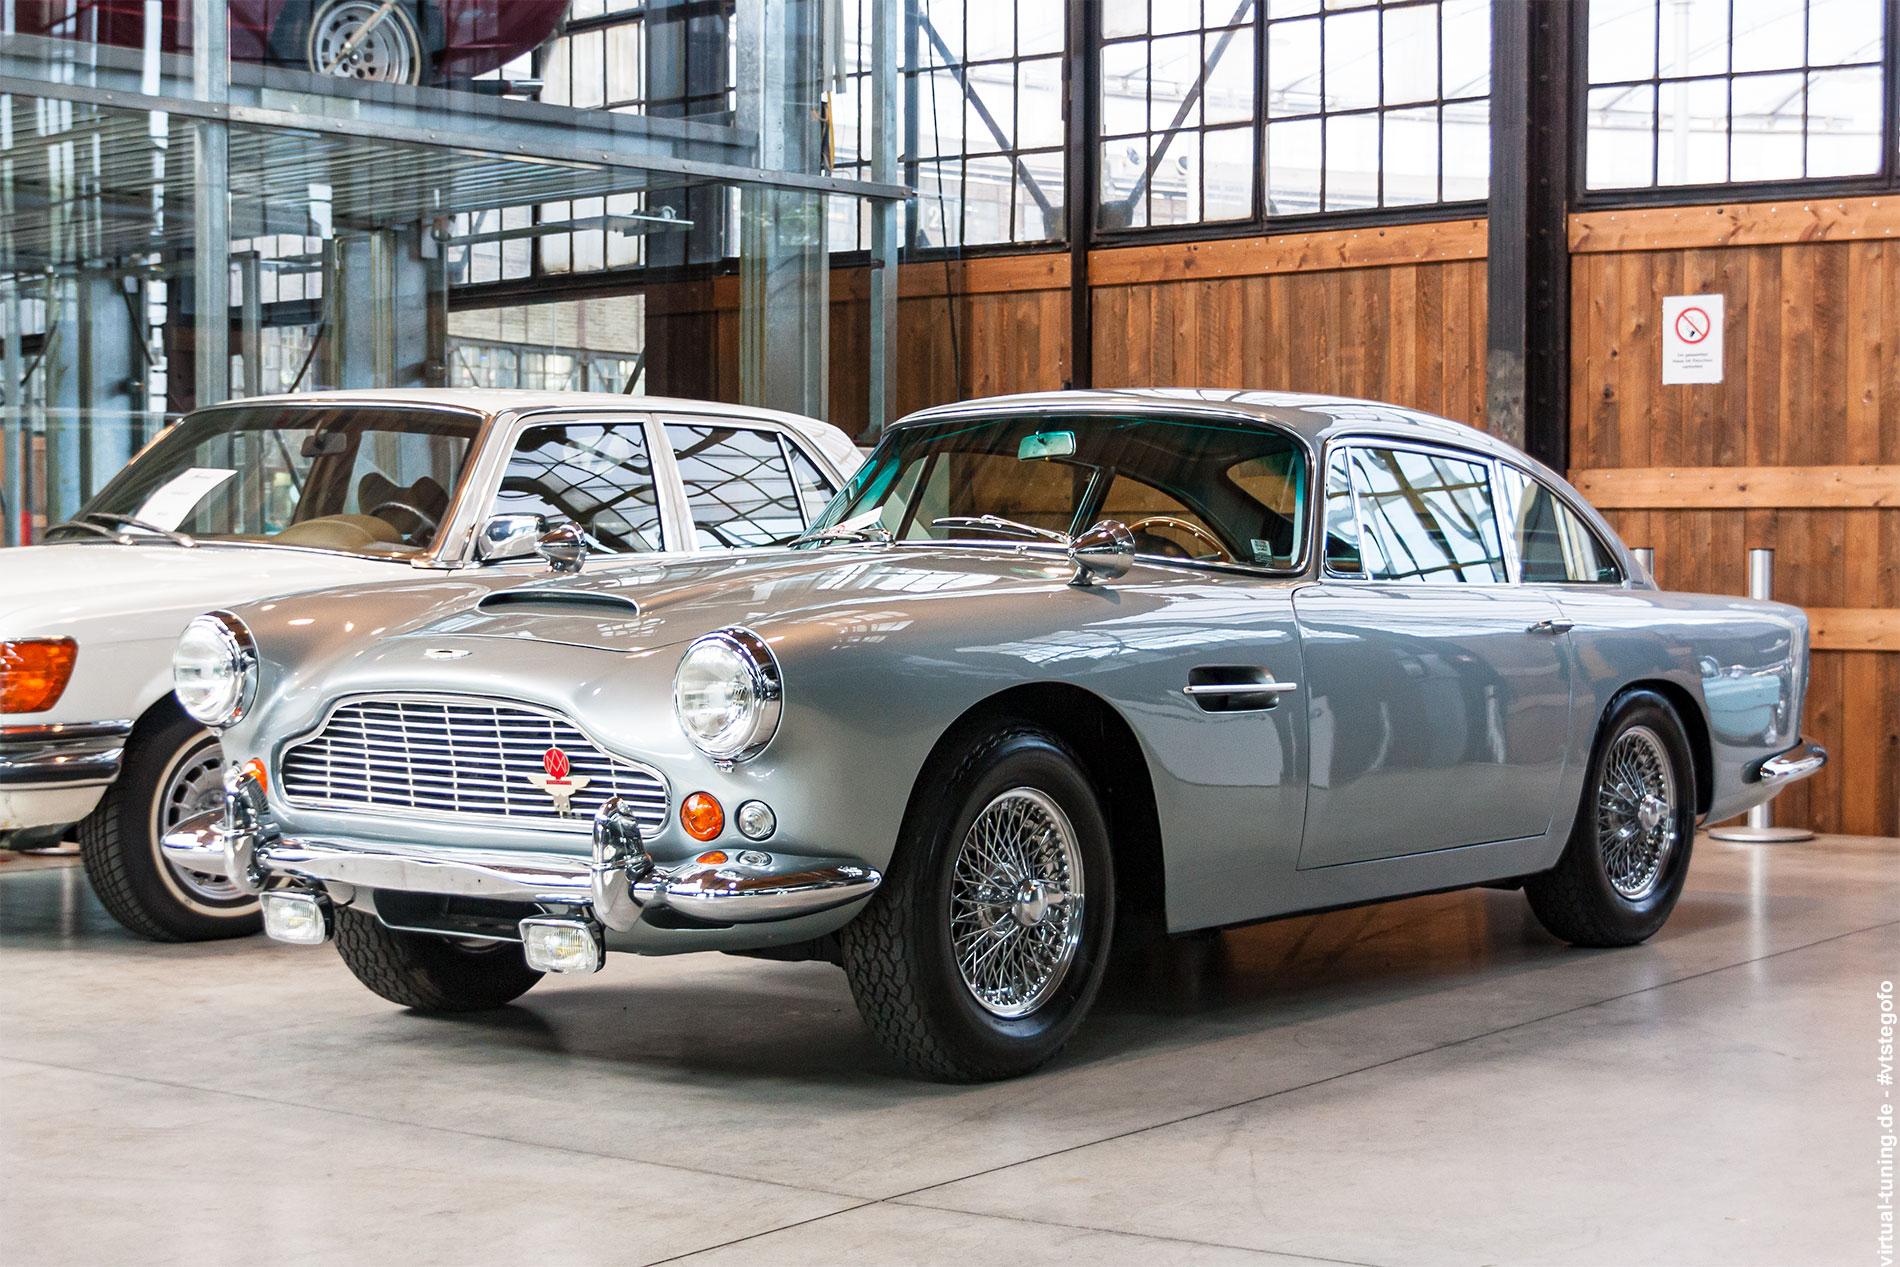 Aston Martin DB4 - Classic Remise Düsseldorf